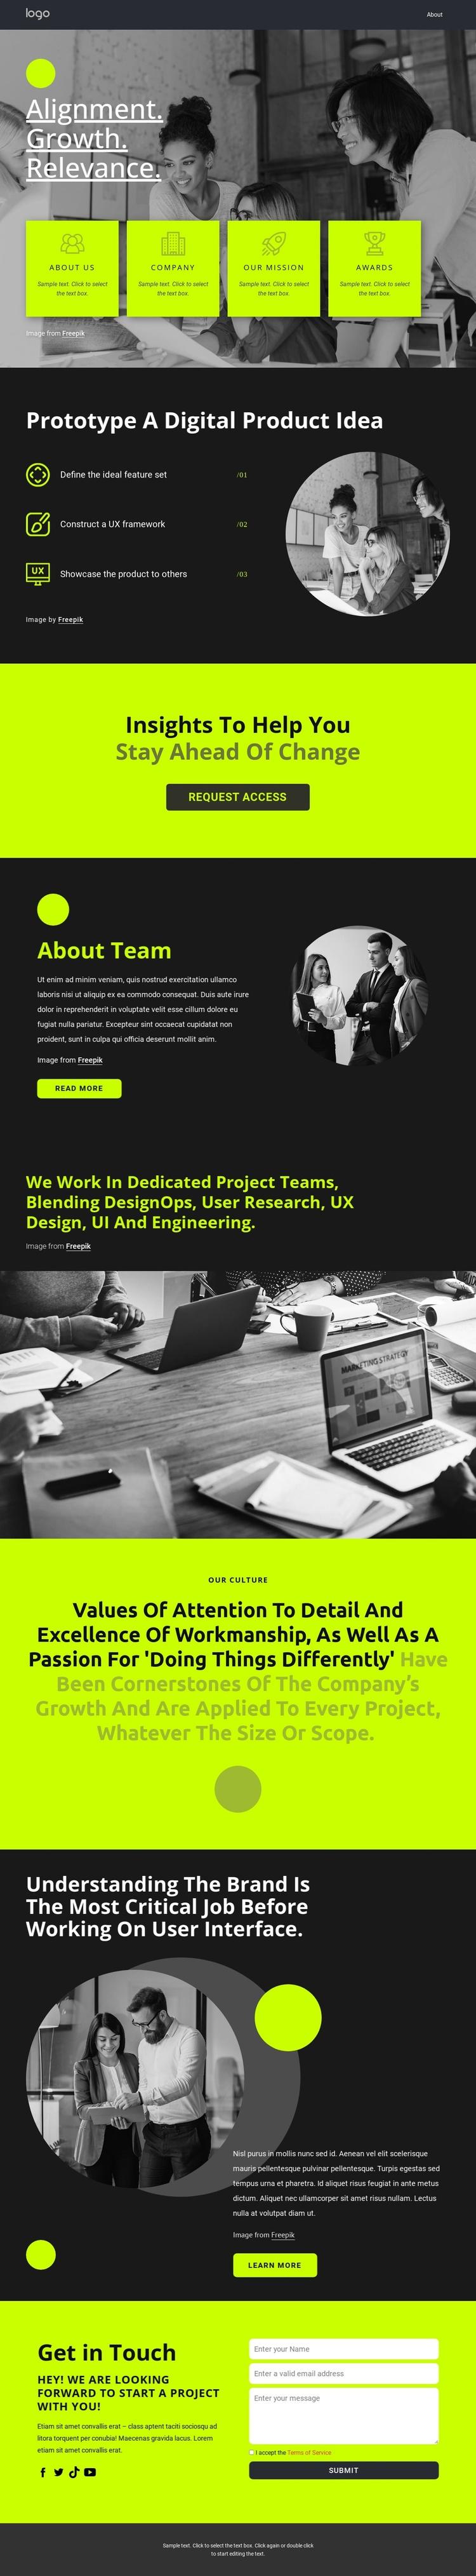 Build great digital products Joomla Template